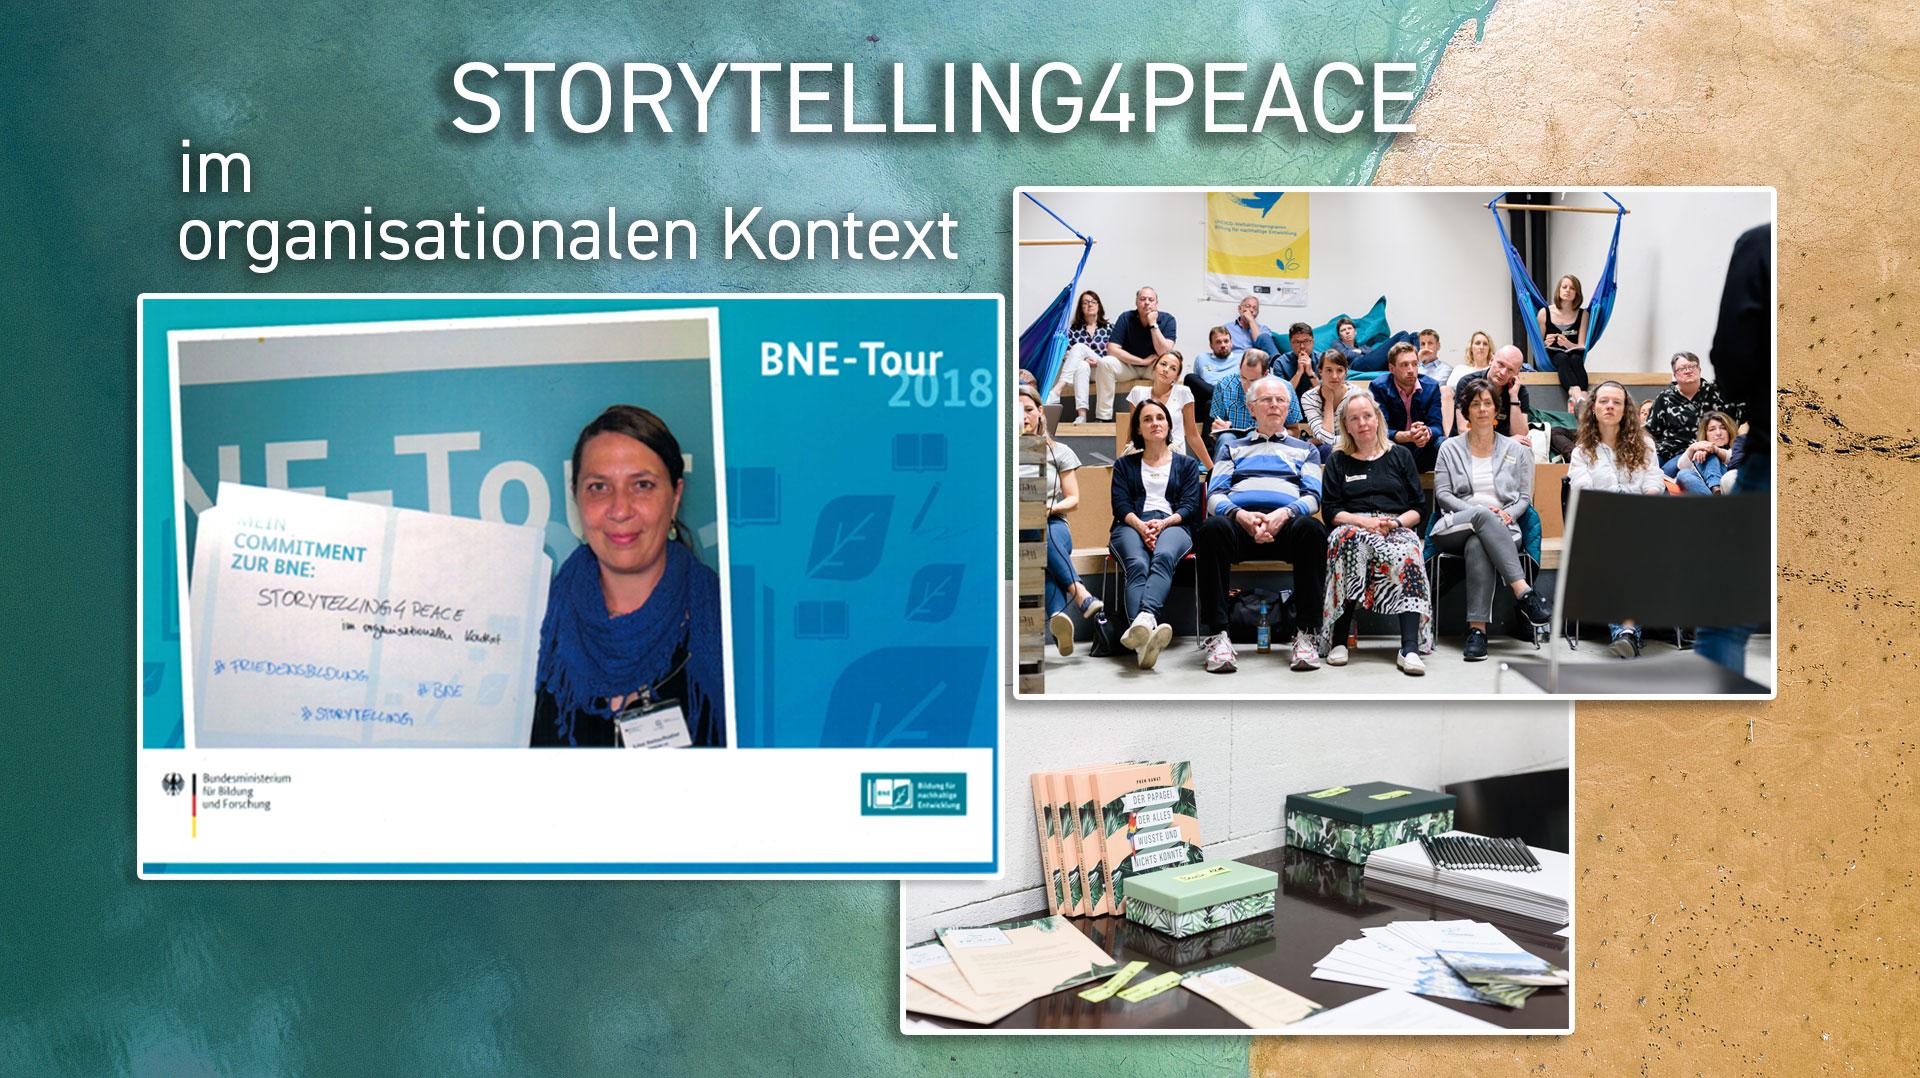 Storytelling4peace